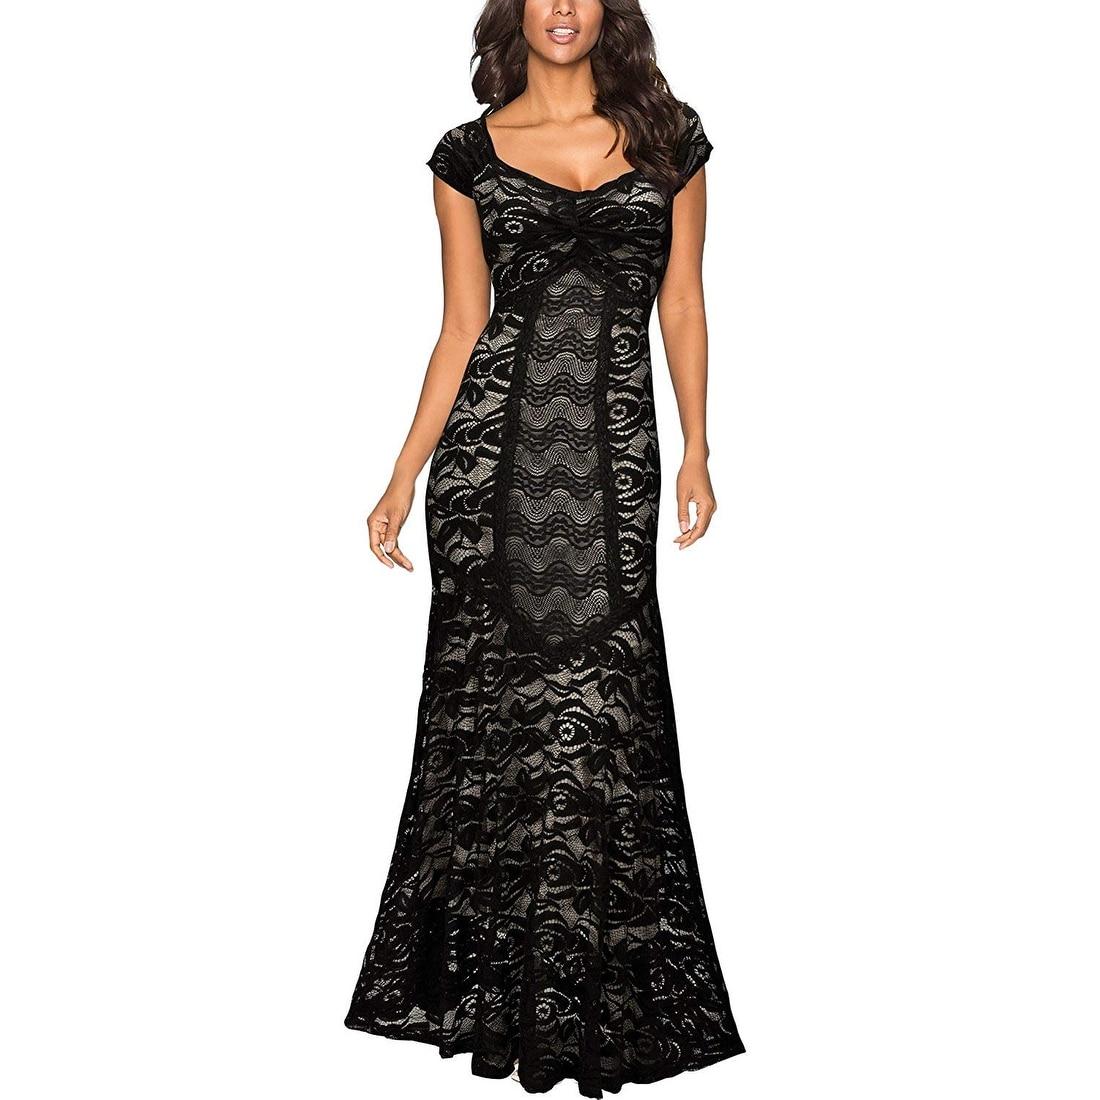 Miusol Black Womens Size Large L Deep V Neck Floral Lace Maxi Dress